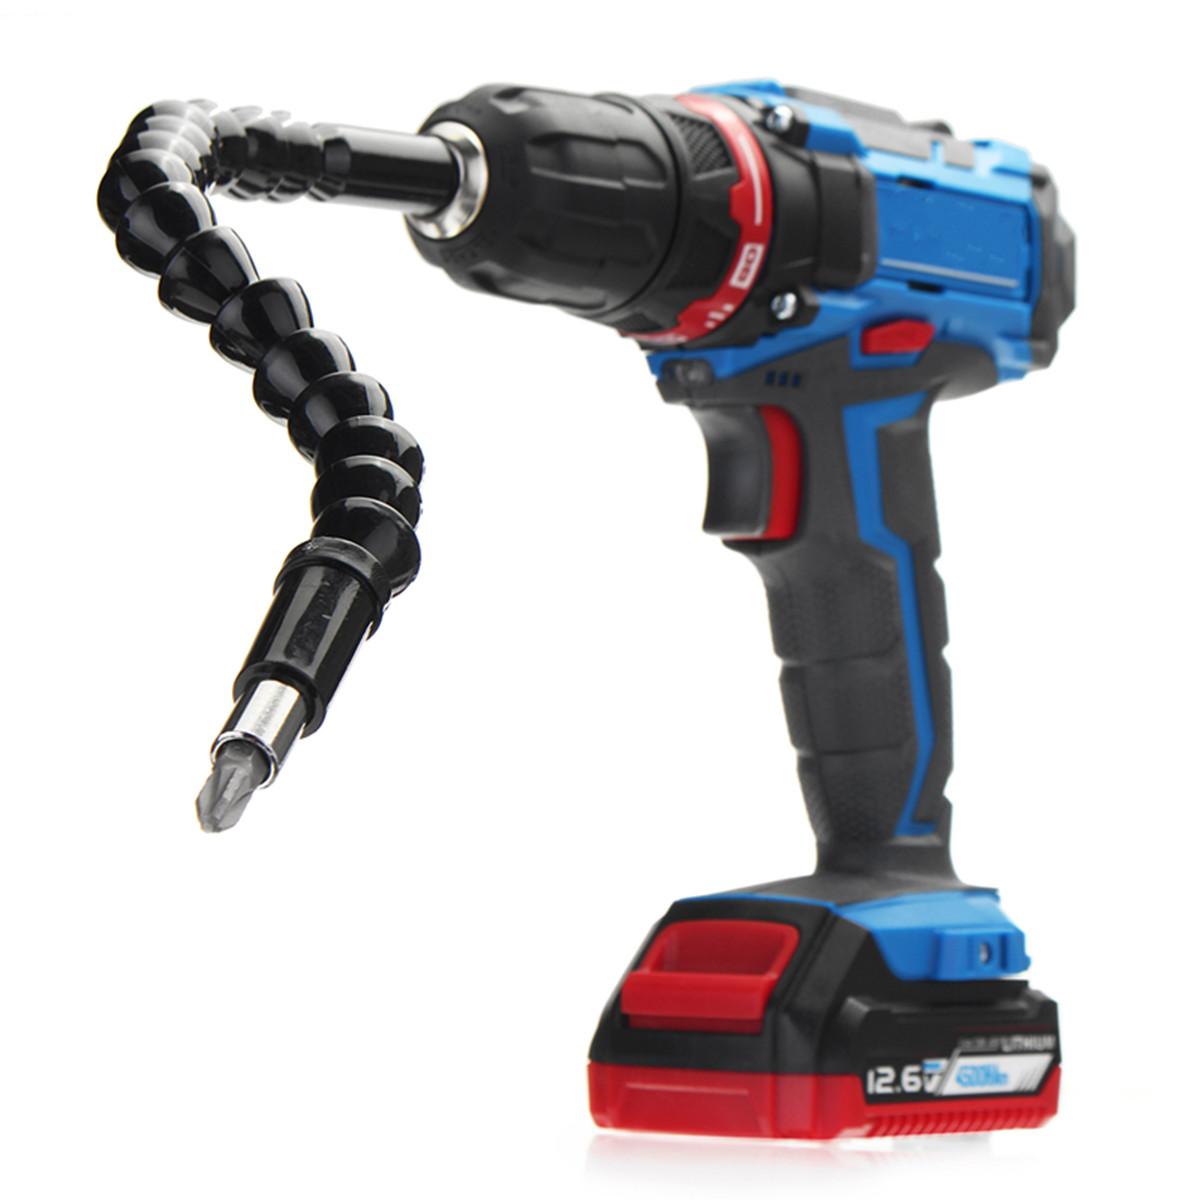 12V Electric Screwdriver Power Screw Driver Drill Set 1